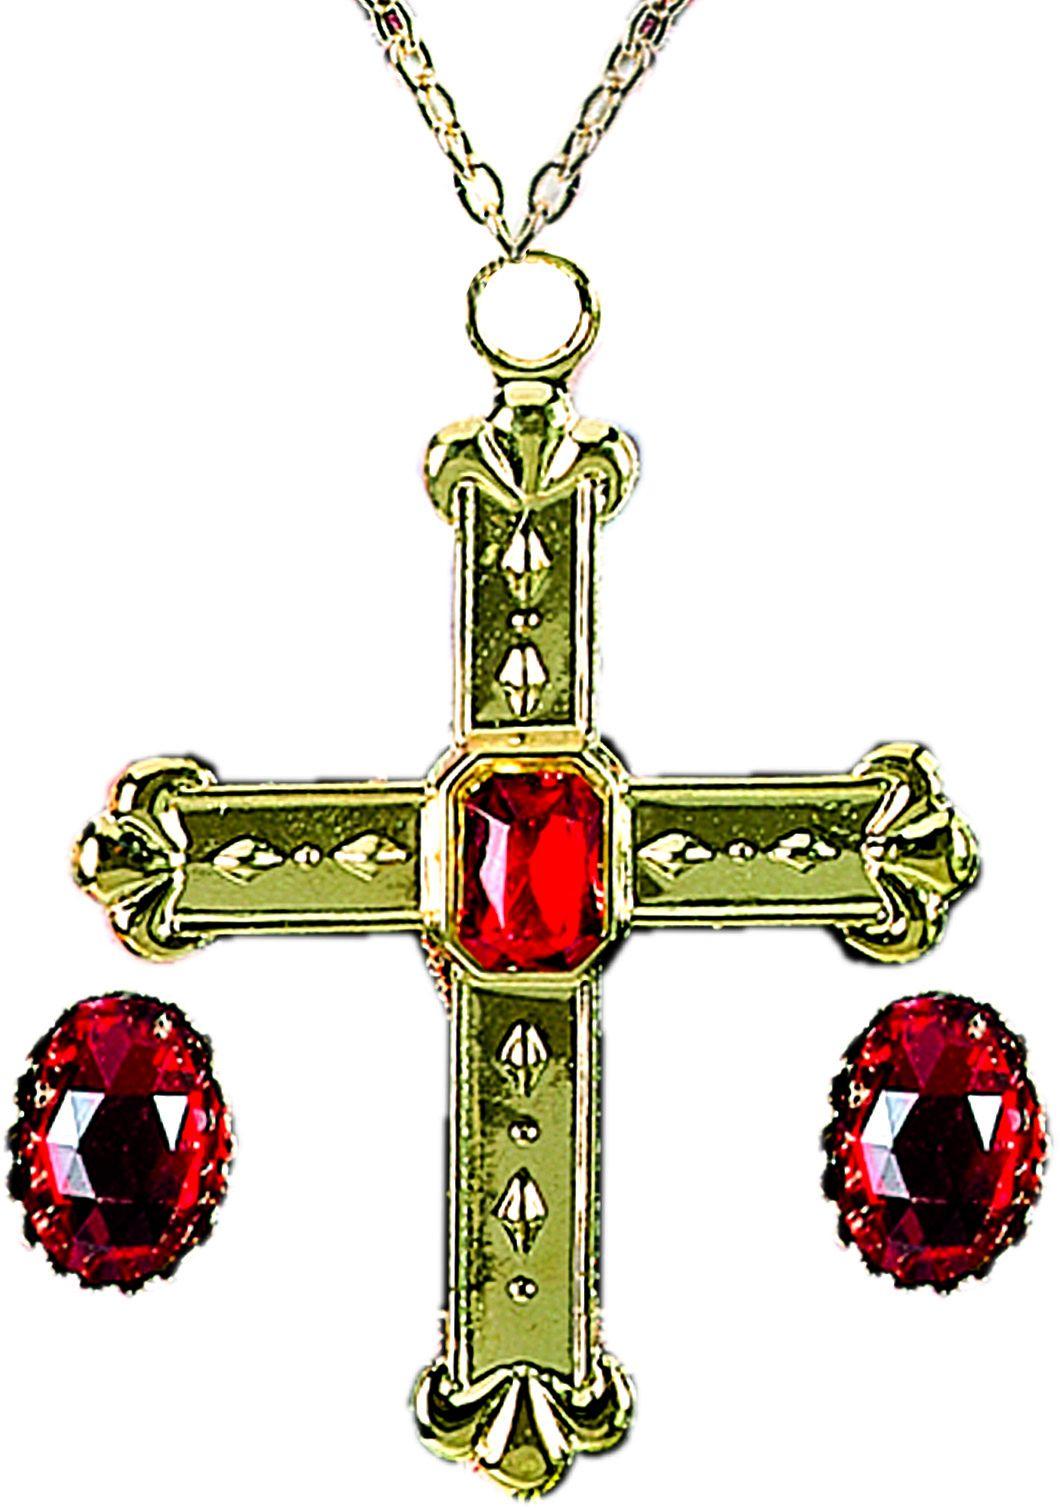 Kardinaal ketting en ringen